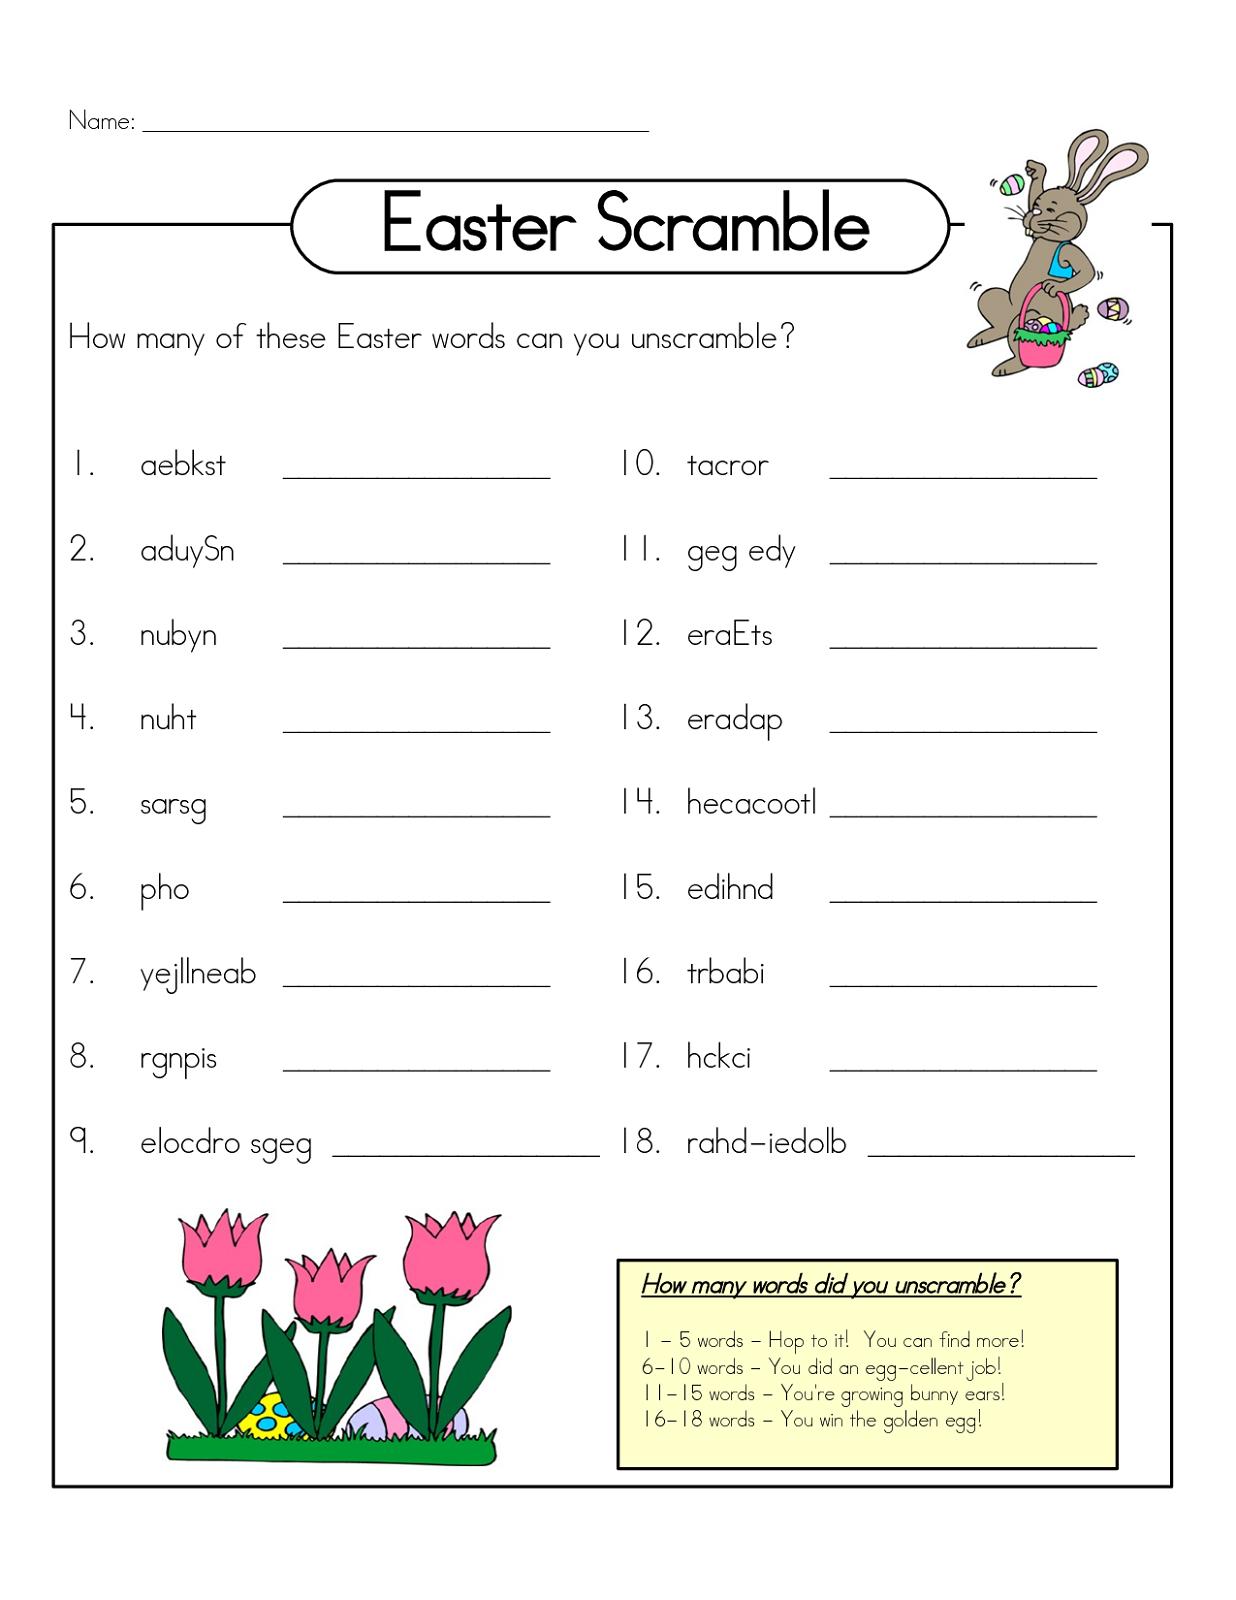 Free Word Scrambles Worksheets | Activity Shelter | Free Printable Word Scramble Worksheets